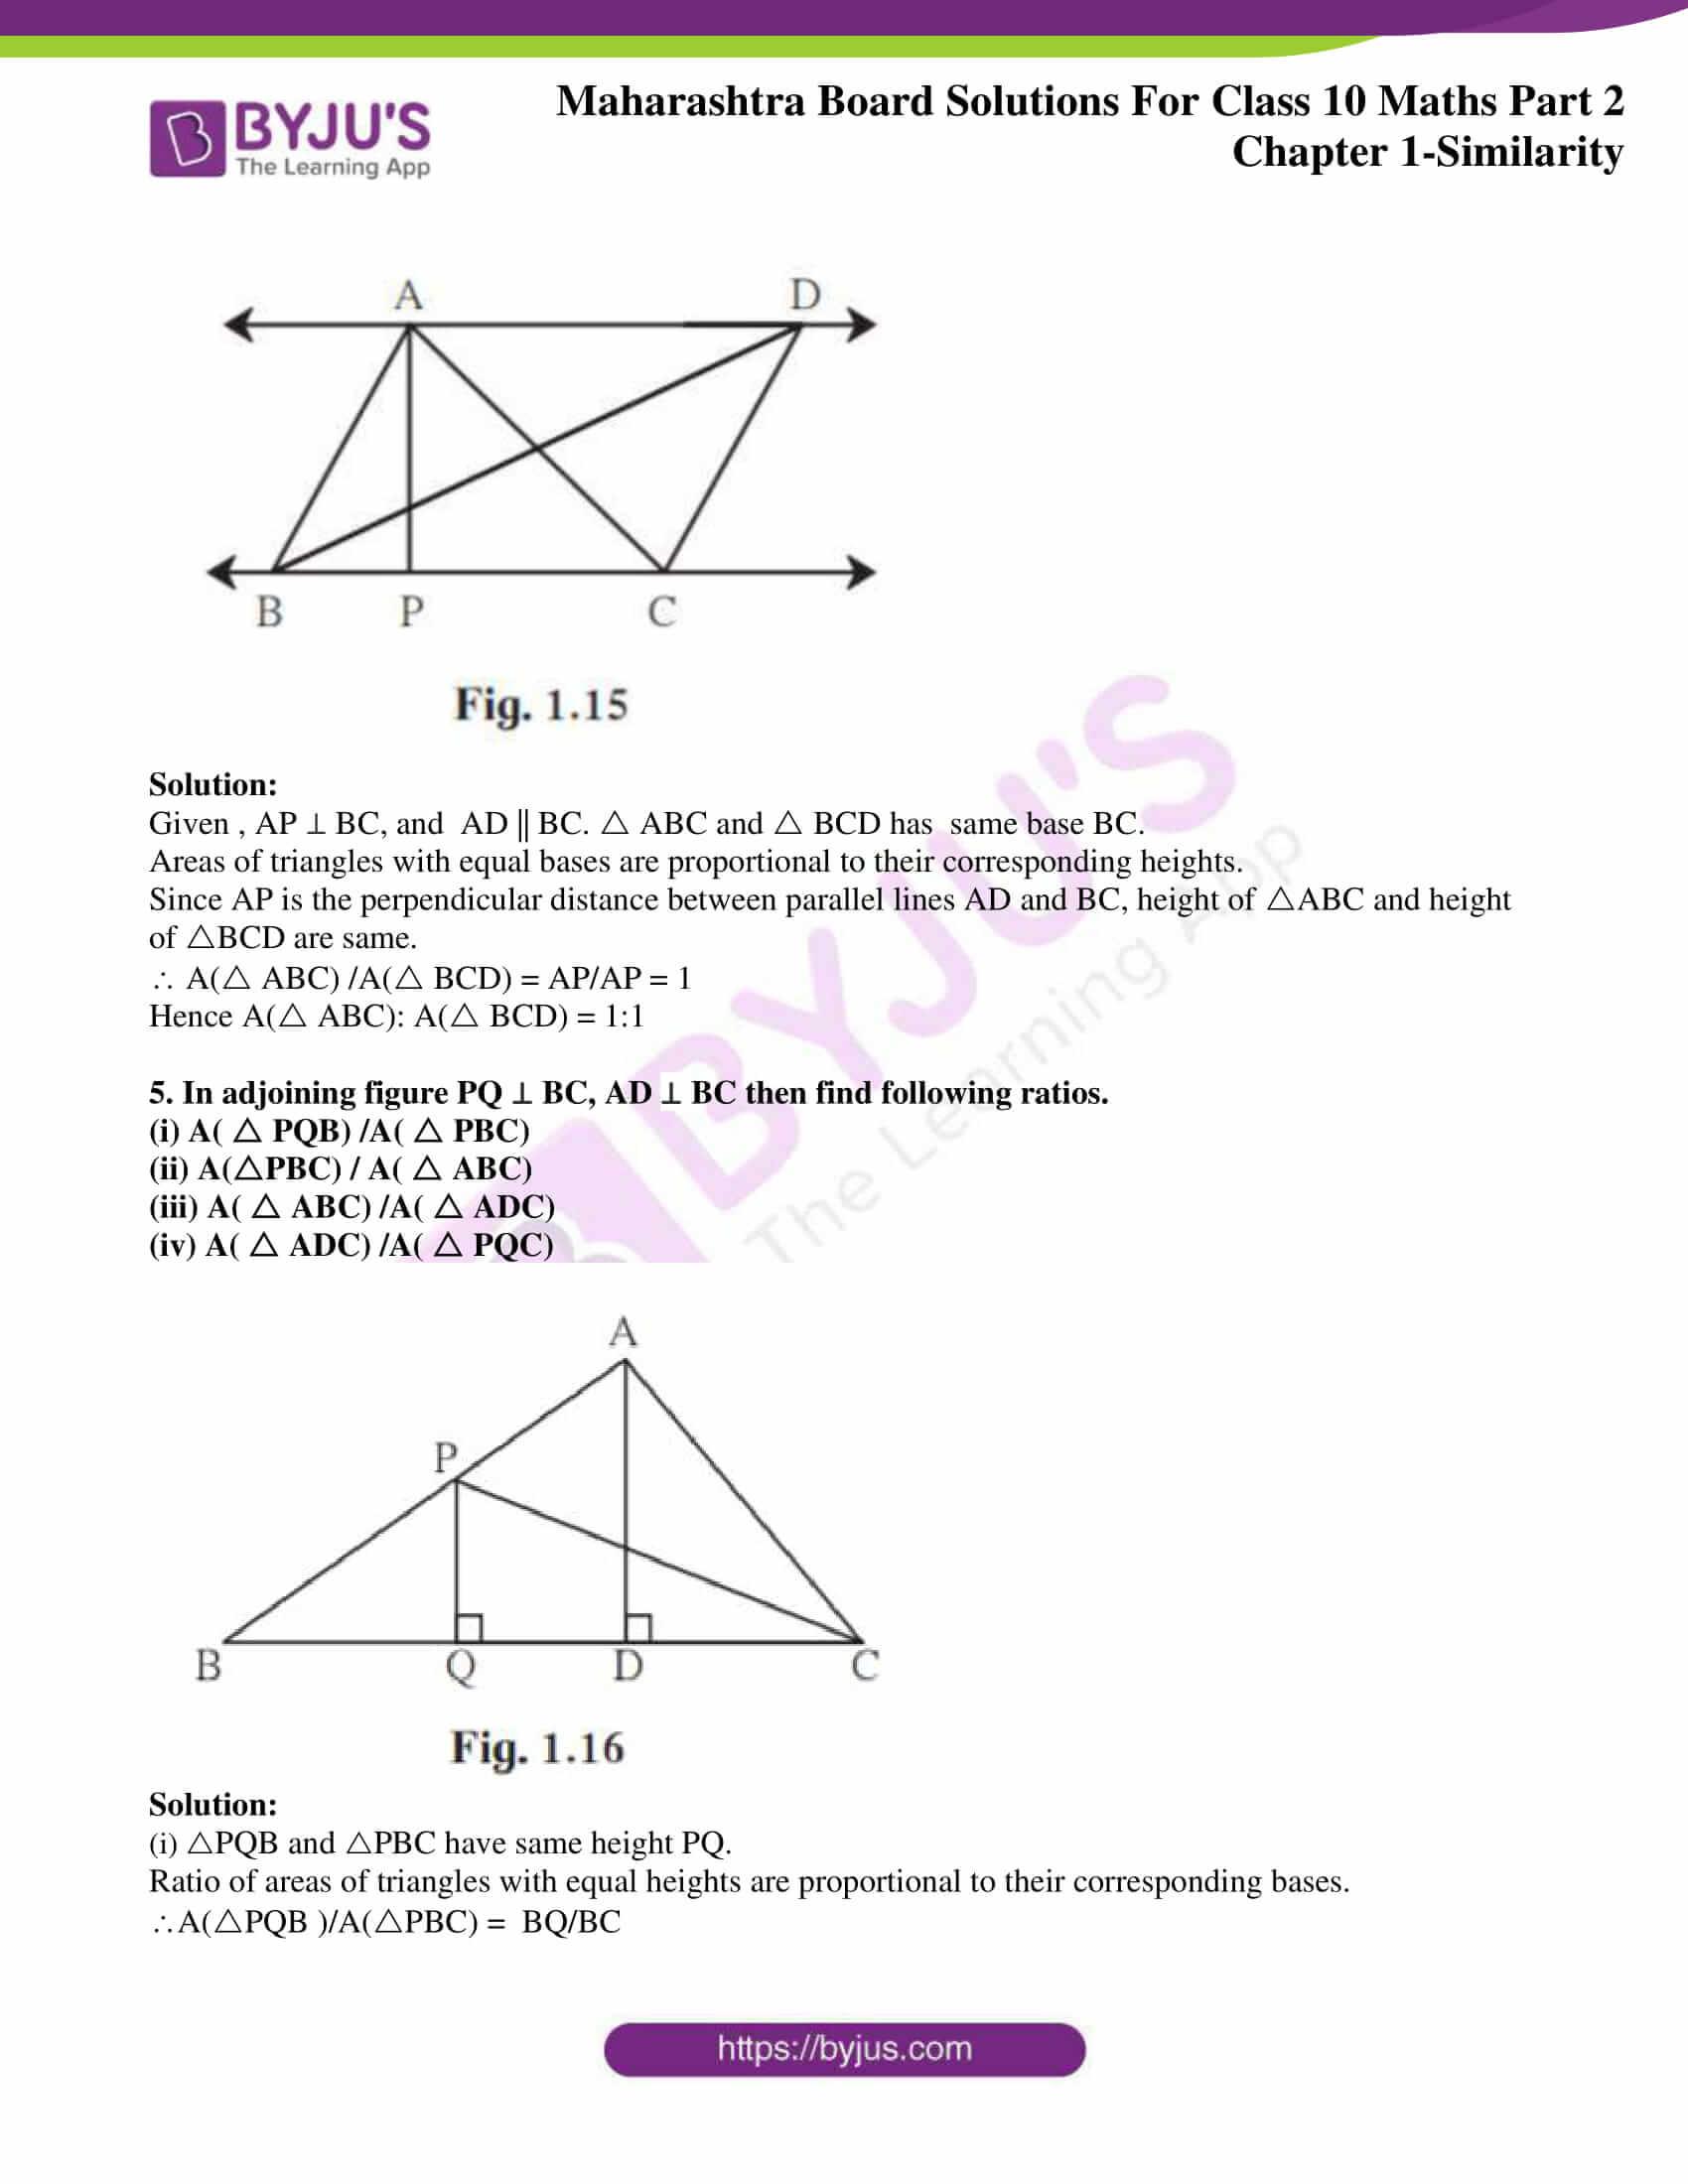 msbshse sol class 10 maths part 2 chapter 1 03